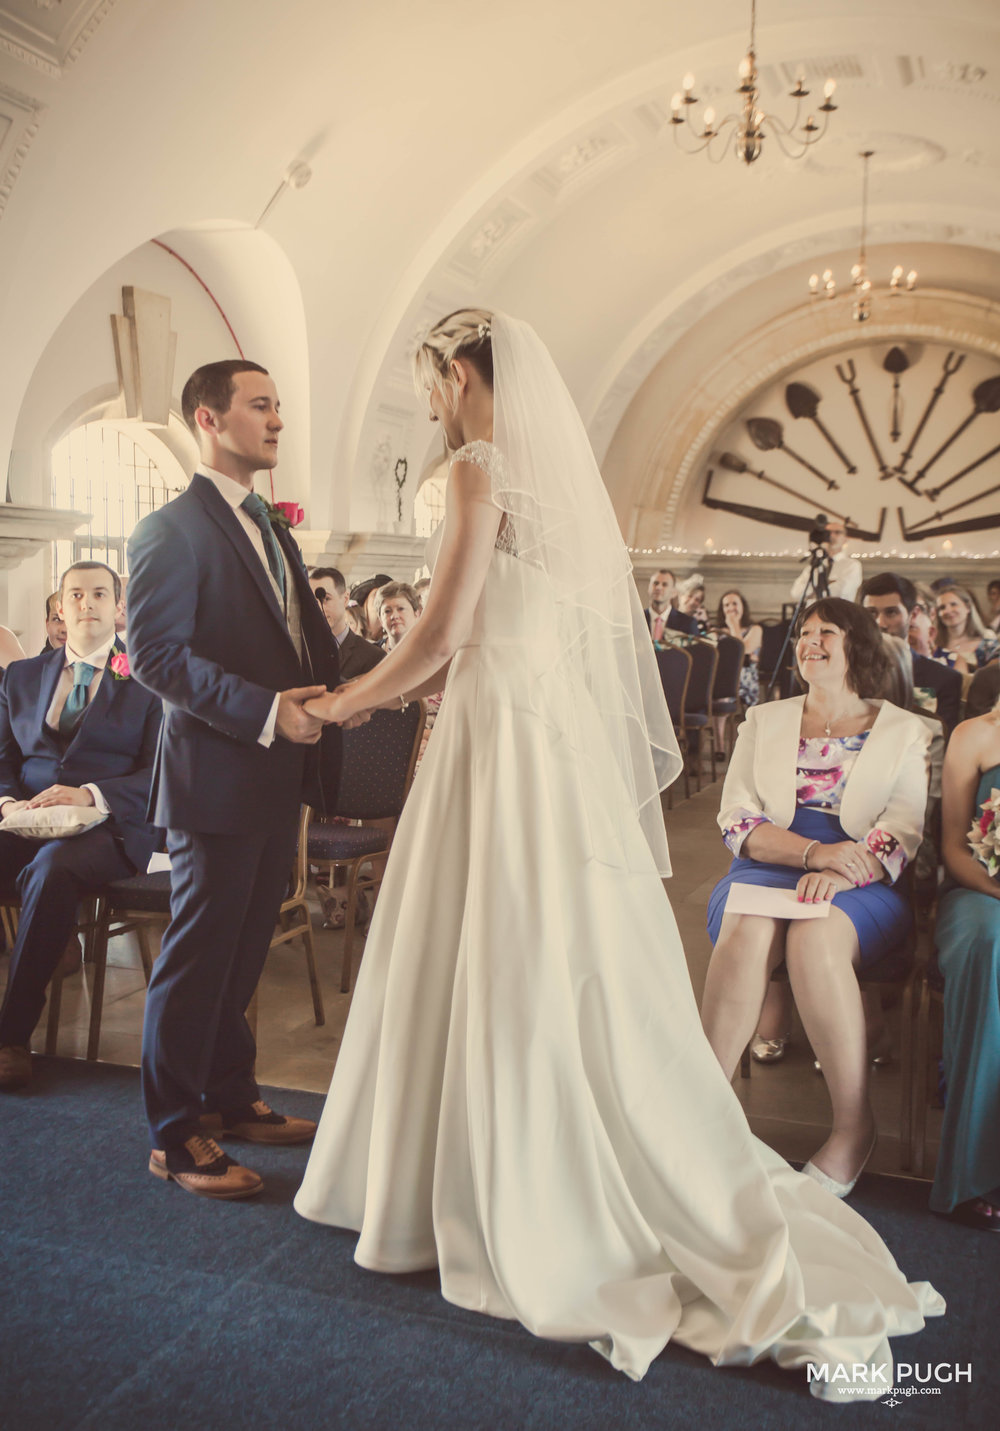 044 - Fliss and Jamie- fineART wedding photography at Rutland Water UK by www.markpugh.com Mark Pugh of www.mpmedia.co.uk_.JPG